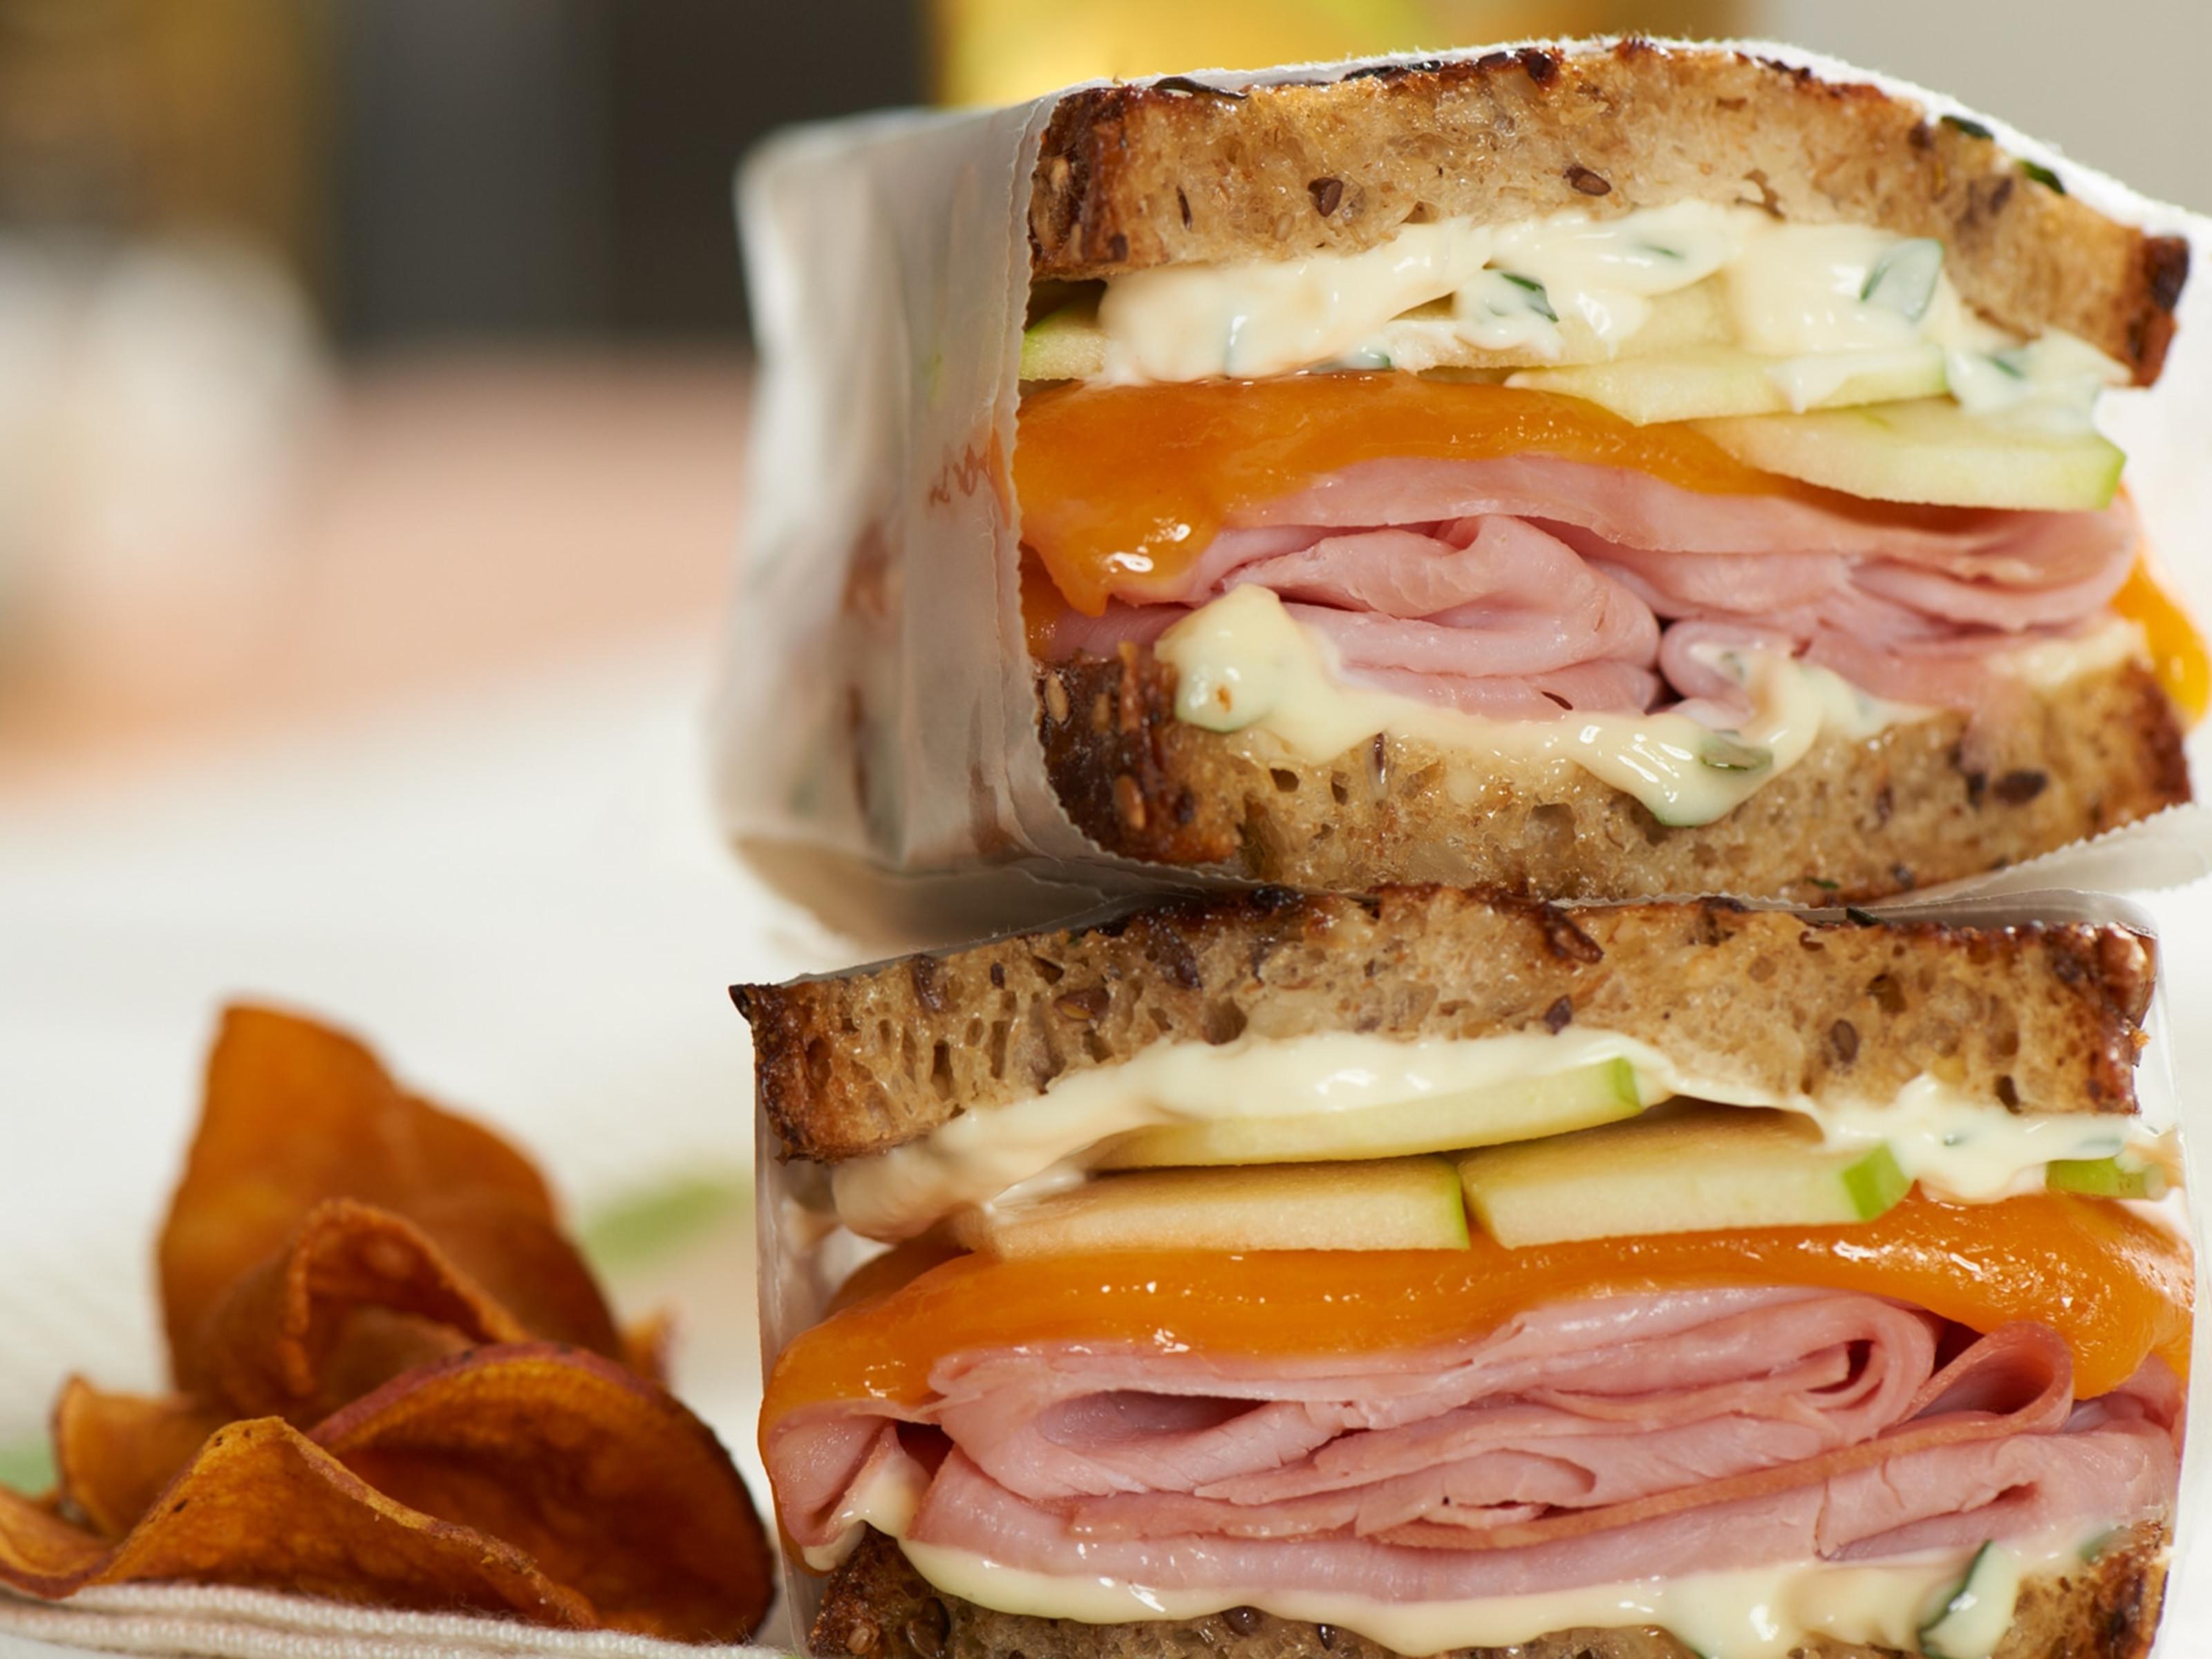 Paleo Tuna Salad, A Lunch Sandwich